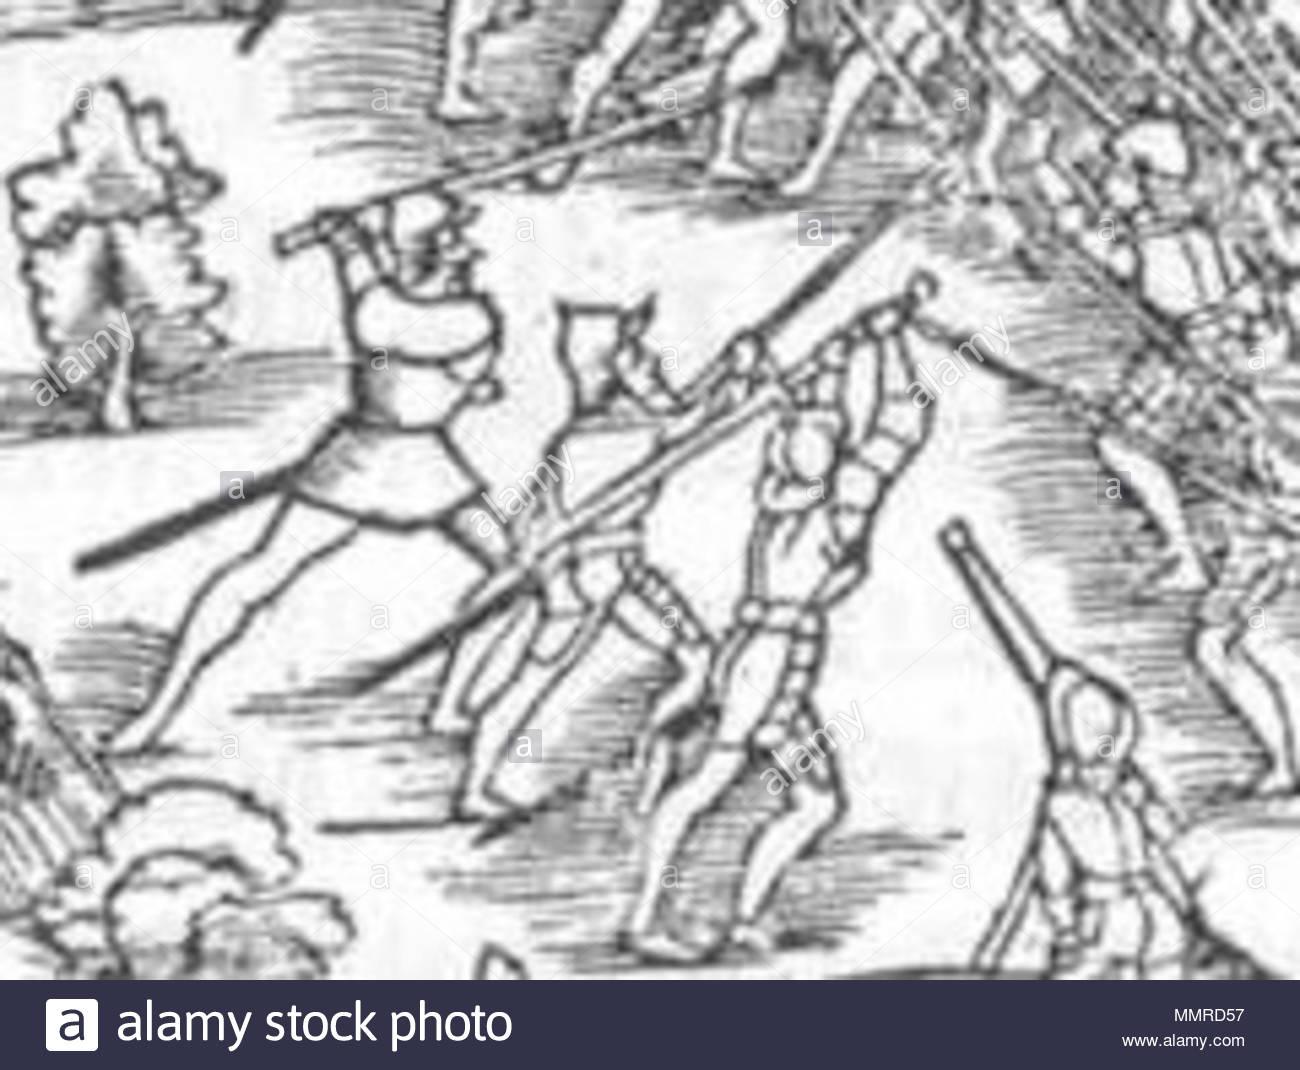 . English: Detail of The battle of Kappel, October 11, 1531.  . 1548. Johannes Stumpf, Hans Asper Battle of Kappel detail Stock Photo